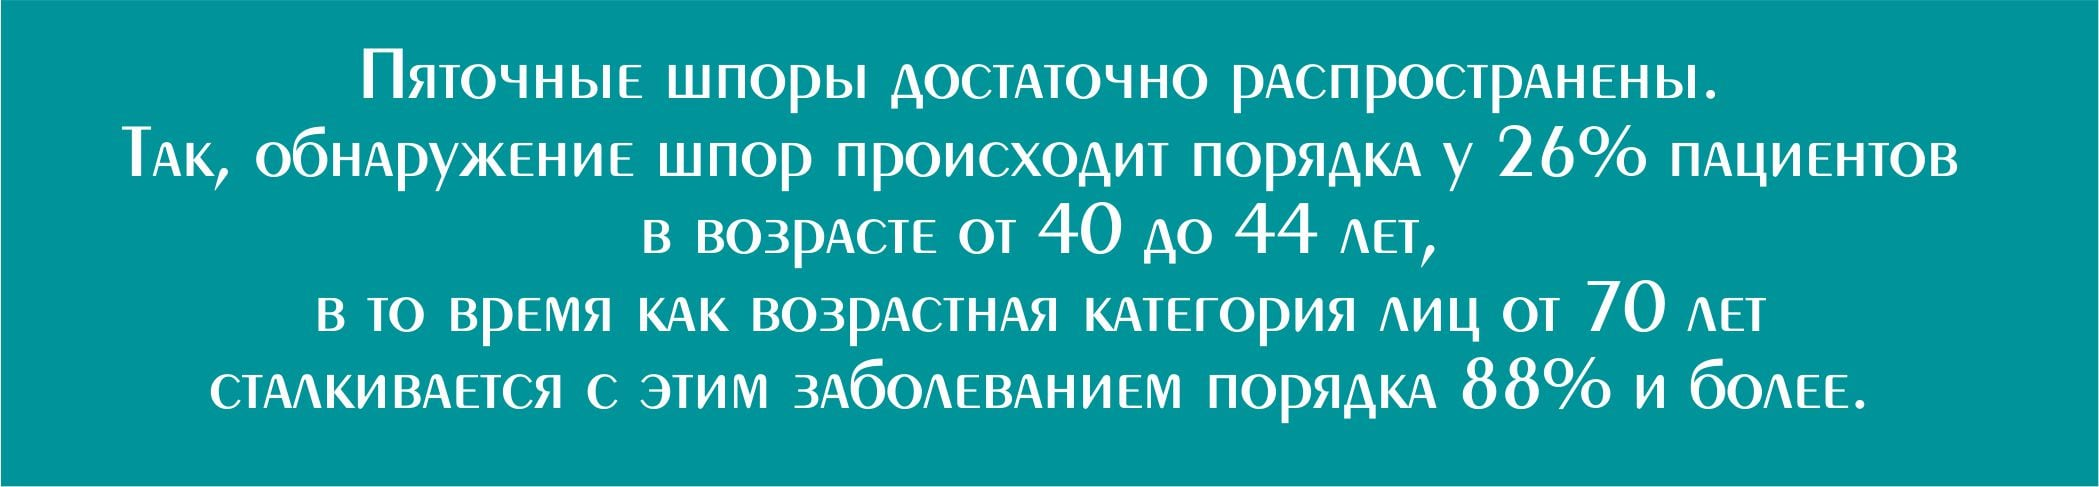 Пяточная шпора_2